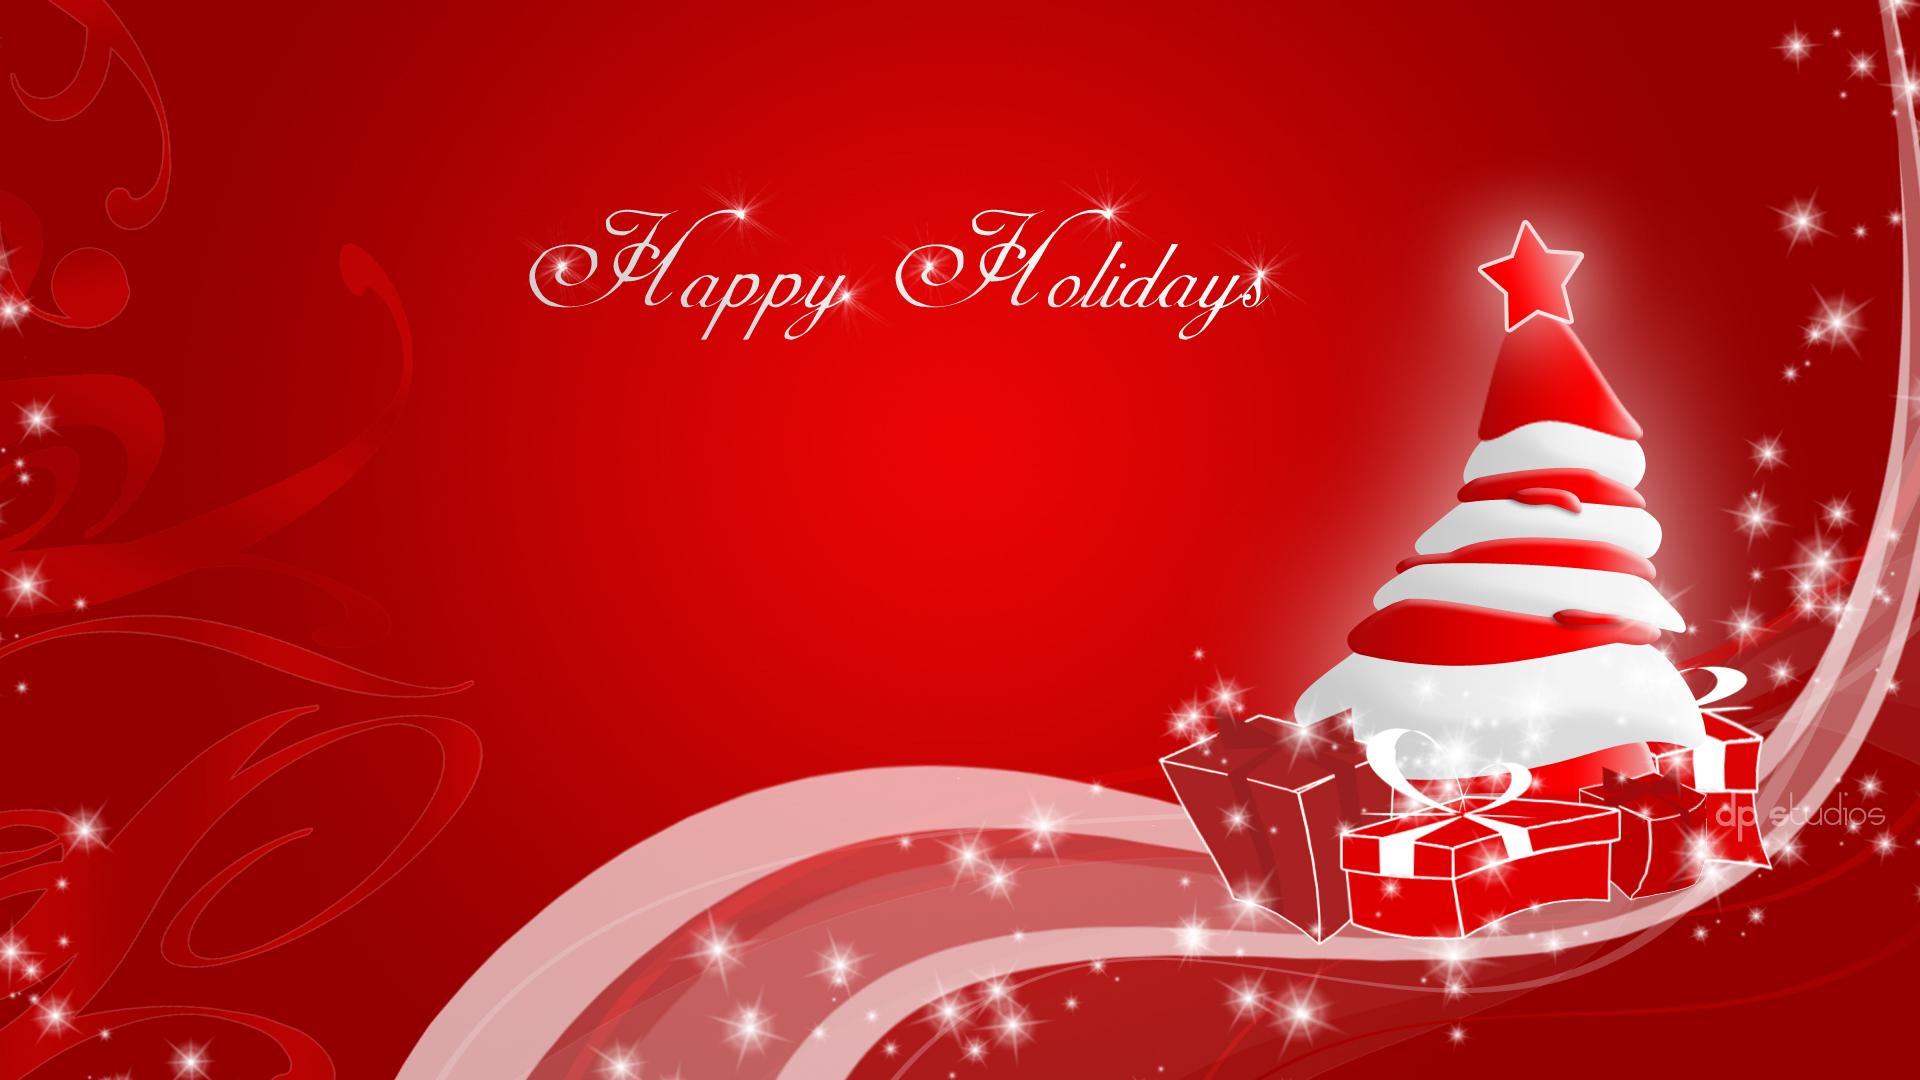 Happy Holidays HD Wallpaper FullHDWpp   Full HD Wallpapers 1920x1080 1920x1080